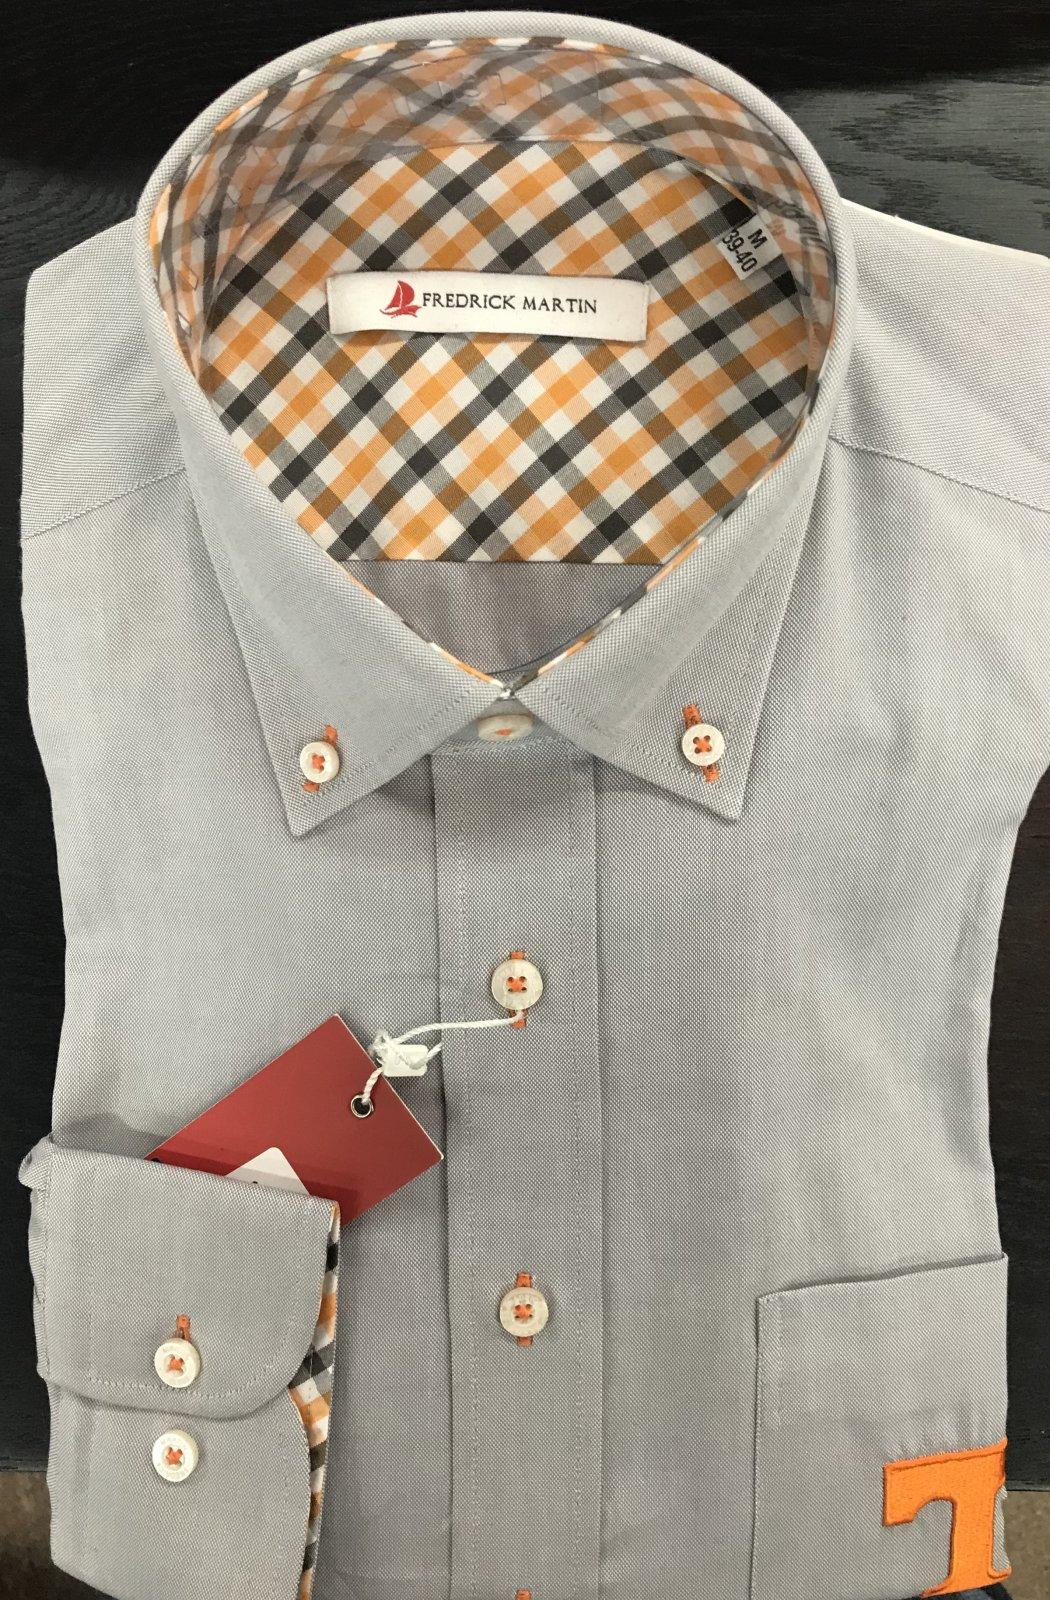 Frederick Martin LS Collegiate Shirt 47-26